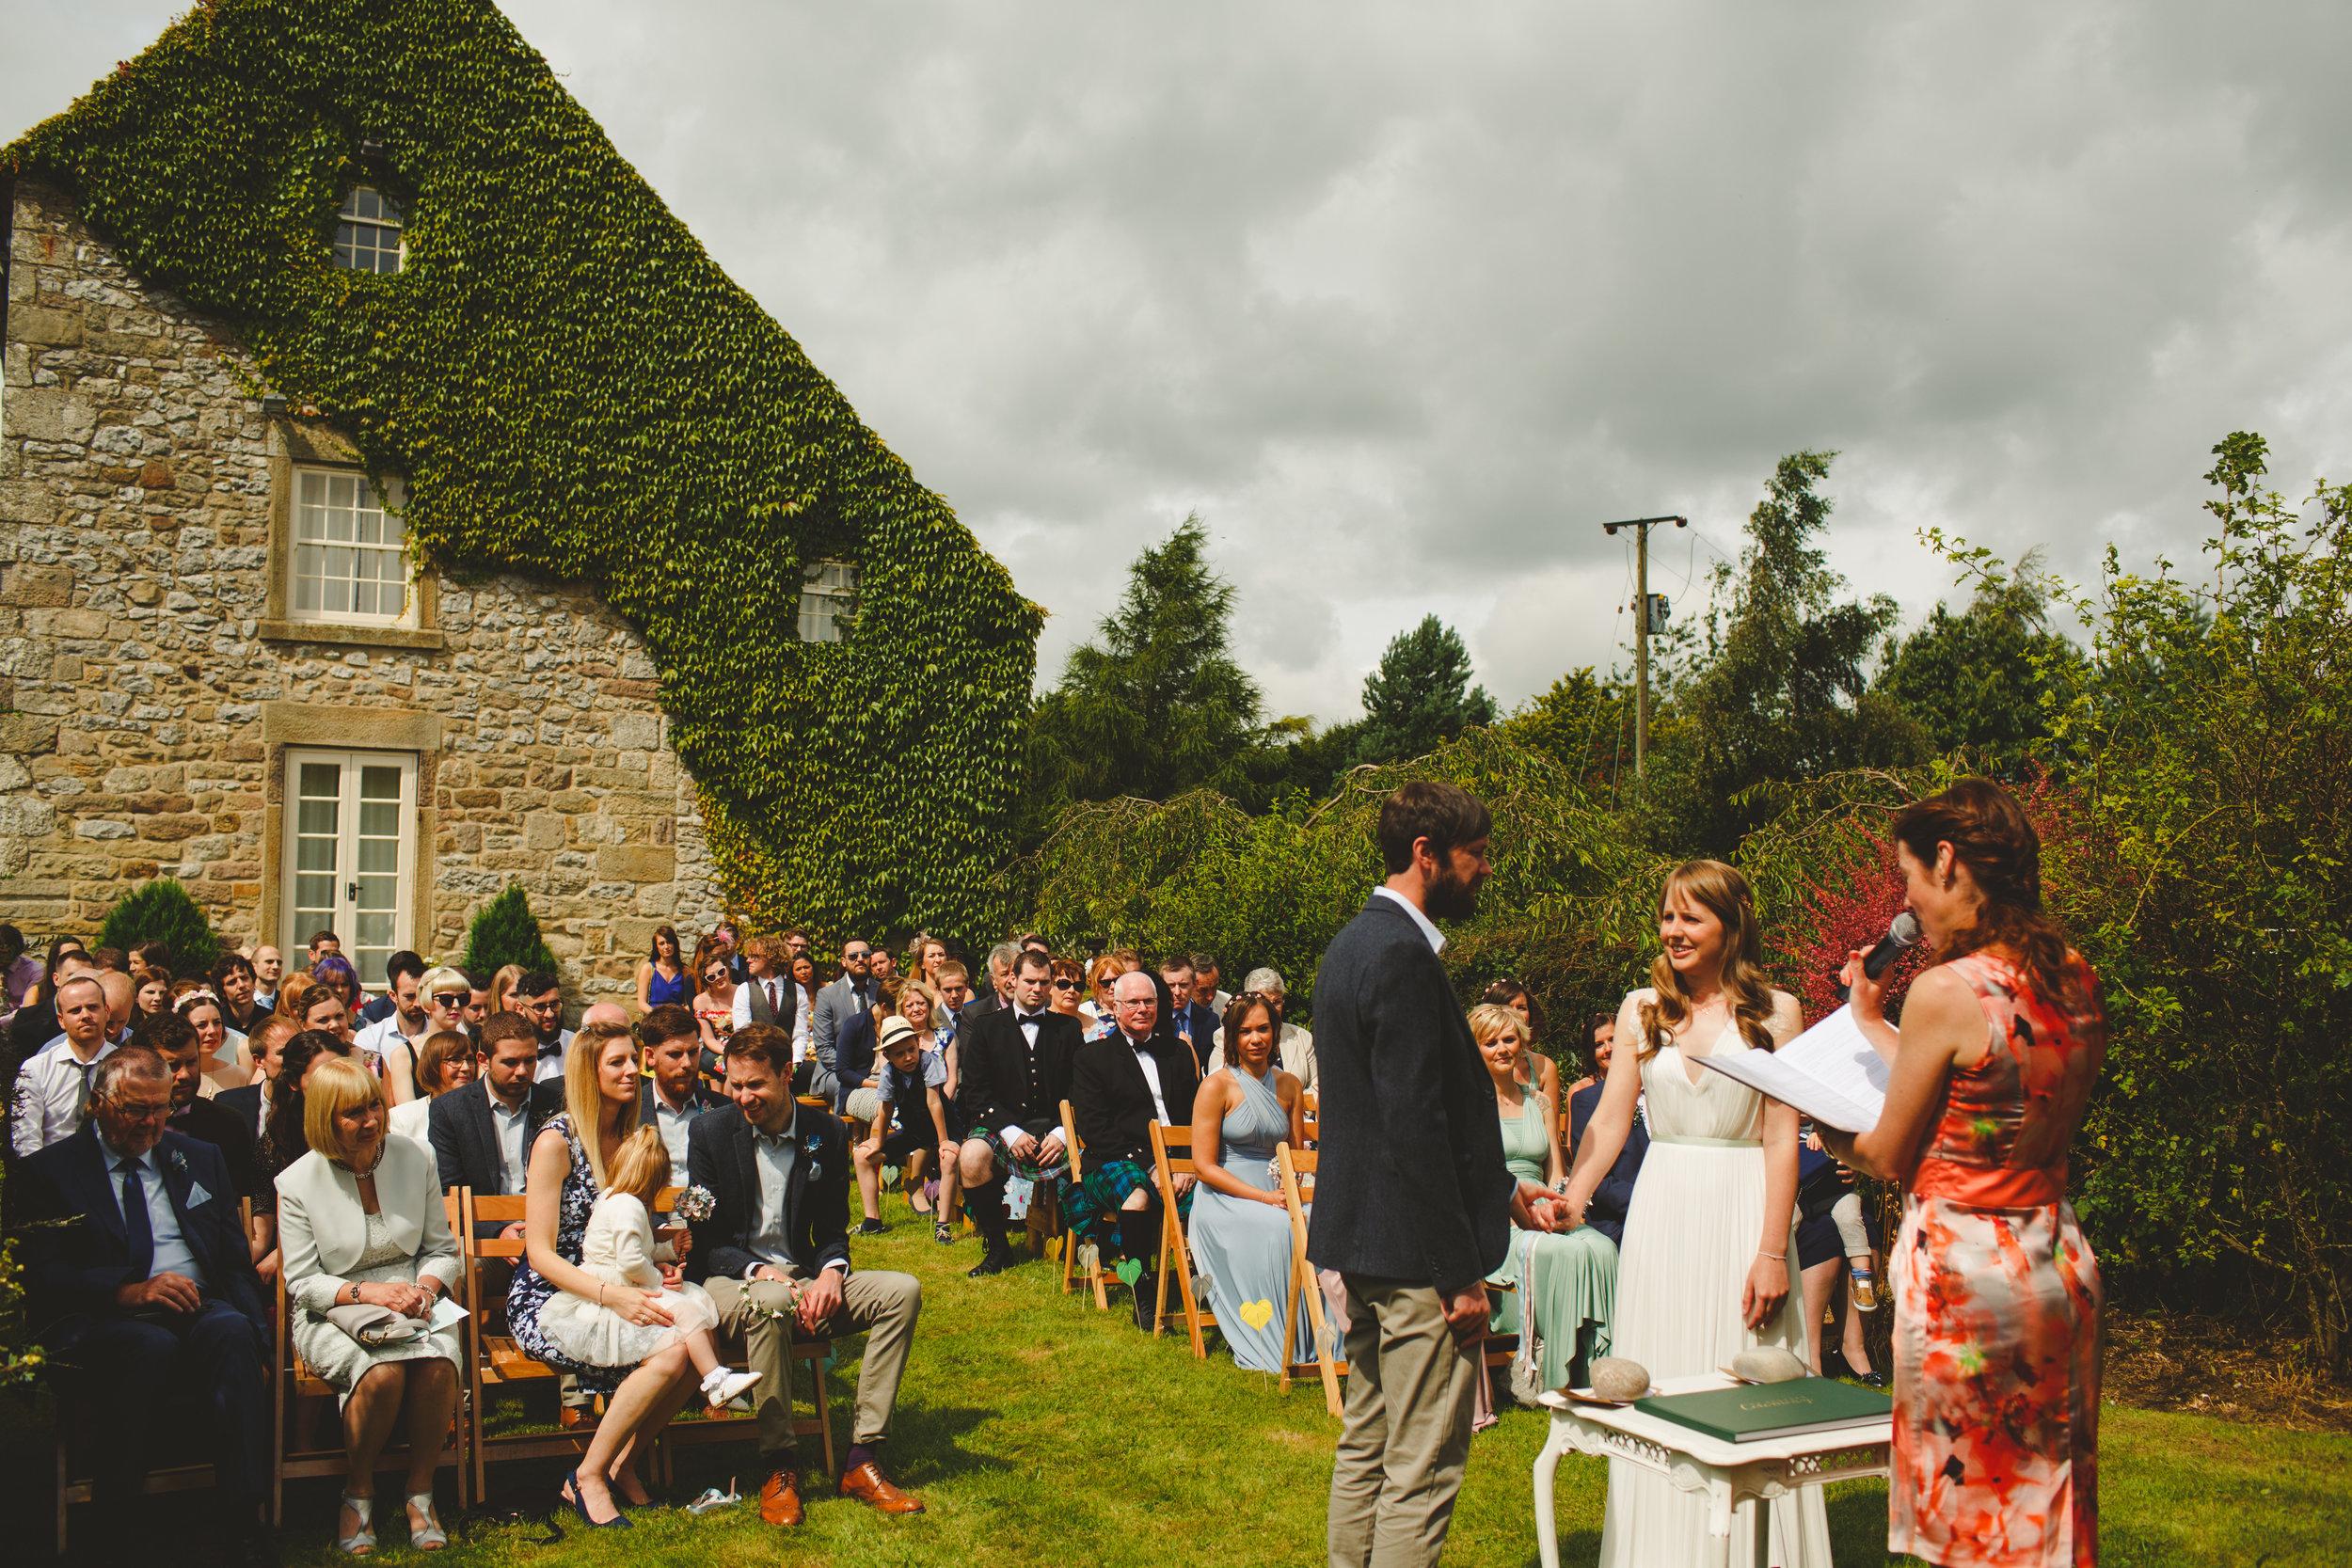 My Perfect Ceremony - Wedding Celebrant Testimonial - Ellie & Tom